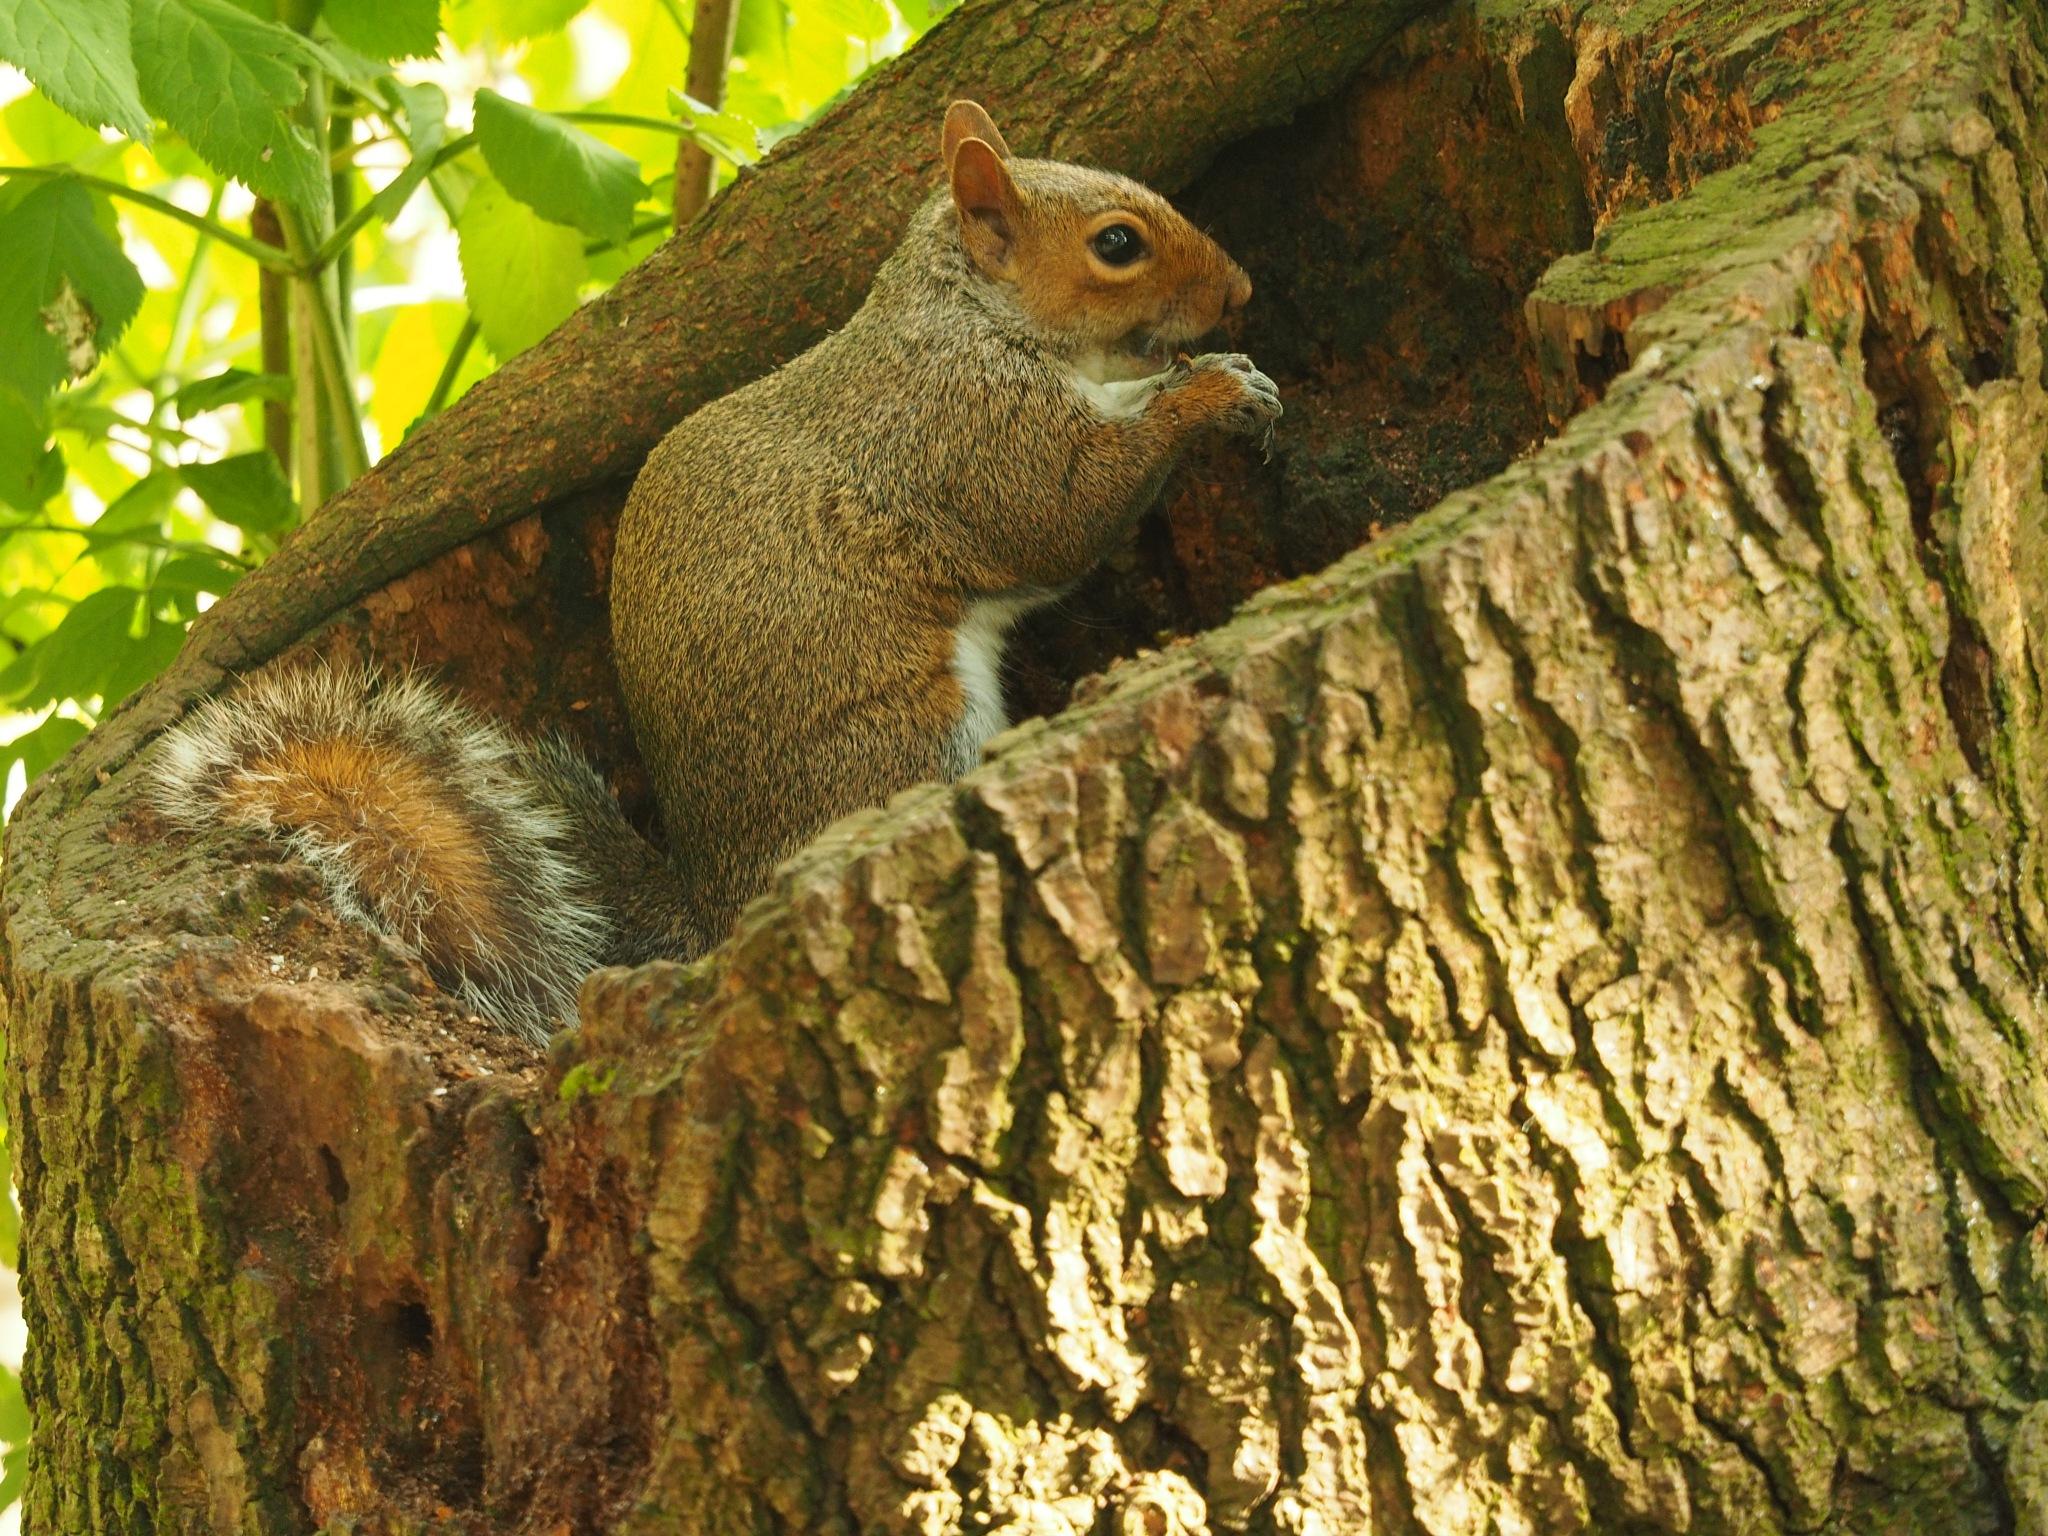 Squirrel feeding by Richard Armstrong